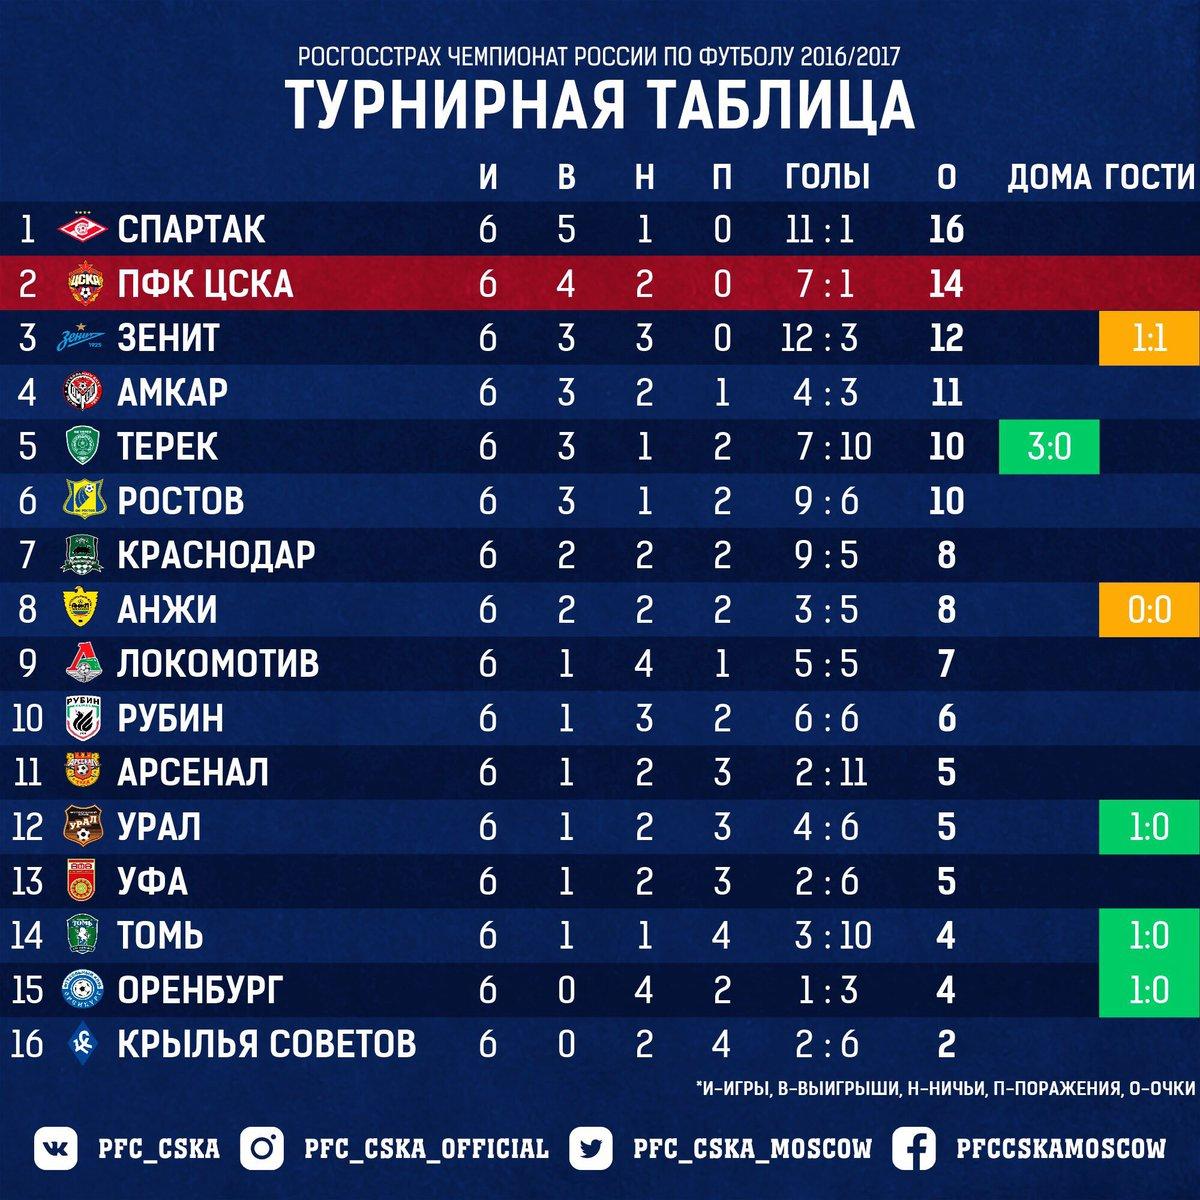 узбекистан чемпионат 2017 таблицу термобелье